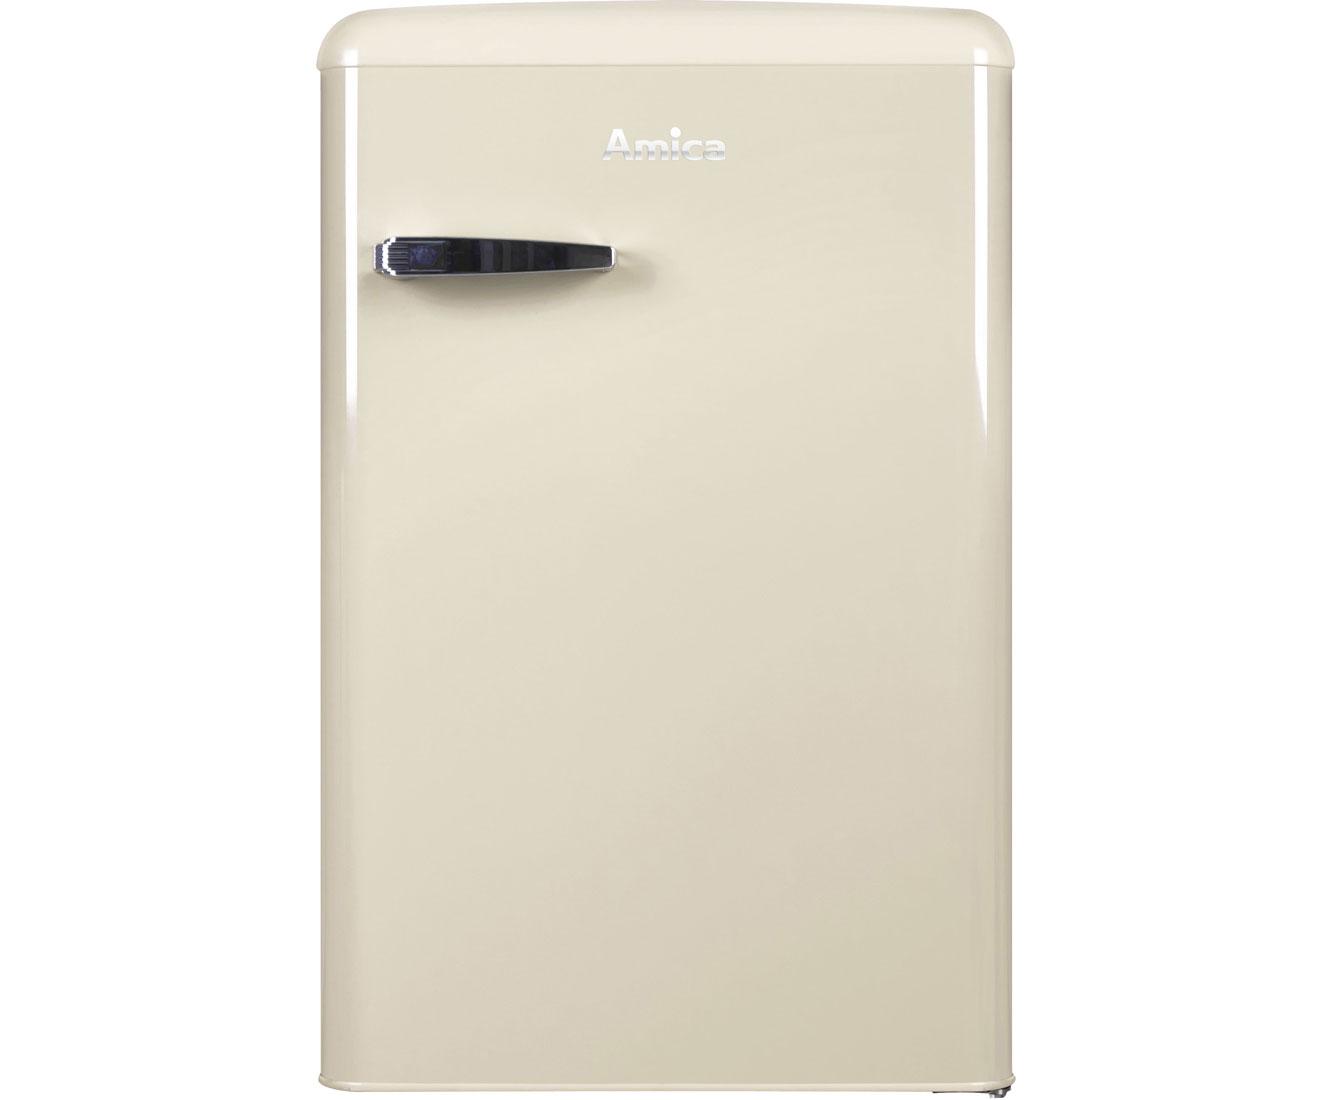 Retro Kühlschrank Weiss : Amica vks 15625 b kühlschrank beige retro design a